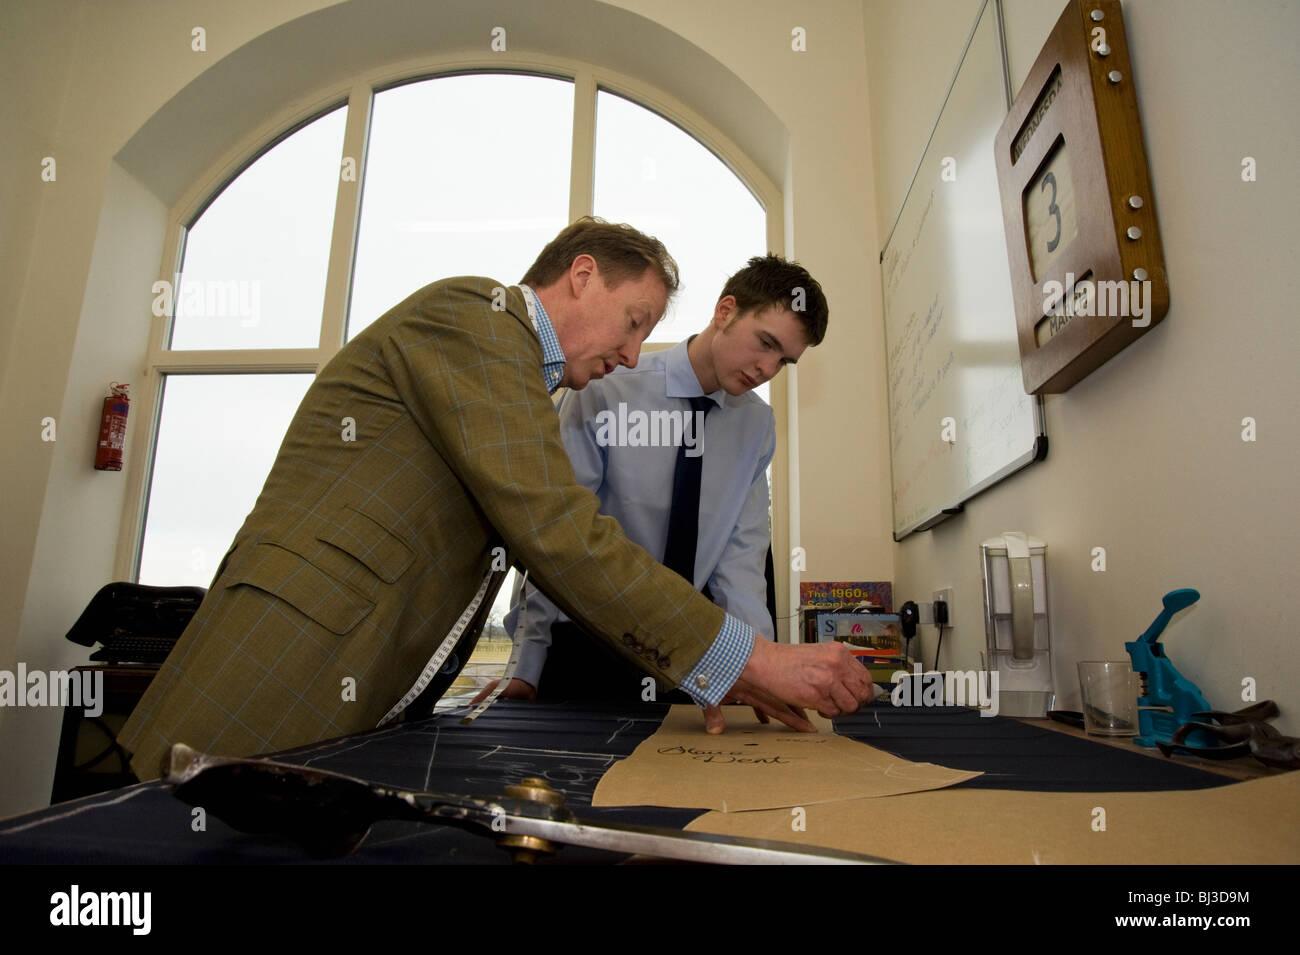 Master tailor Thomas Mahon instructing  his new apprentice the trade of tailoring at his Carlisle base Warwick Hall, - Stock Image